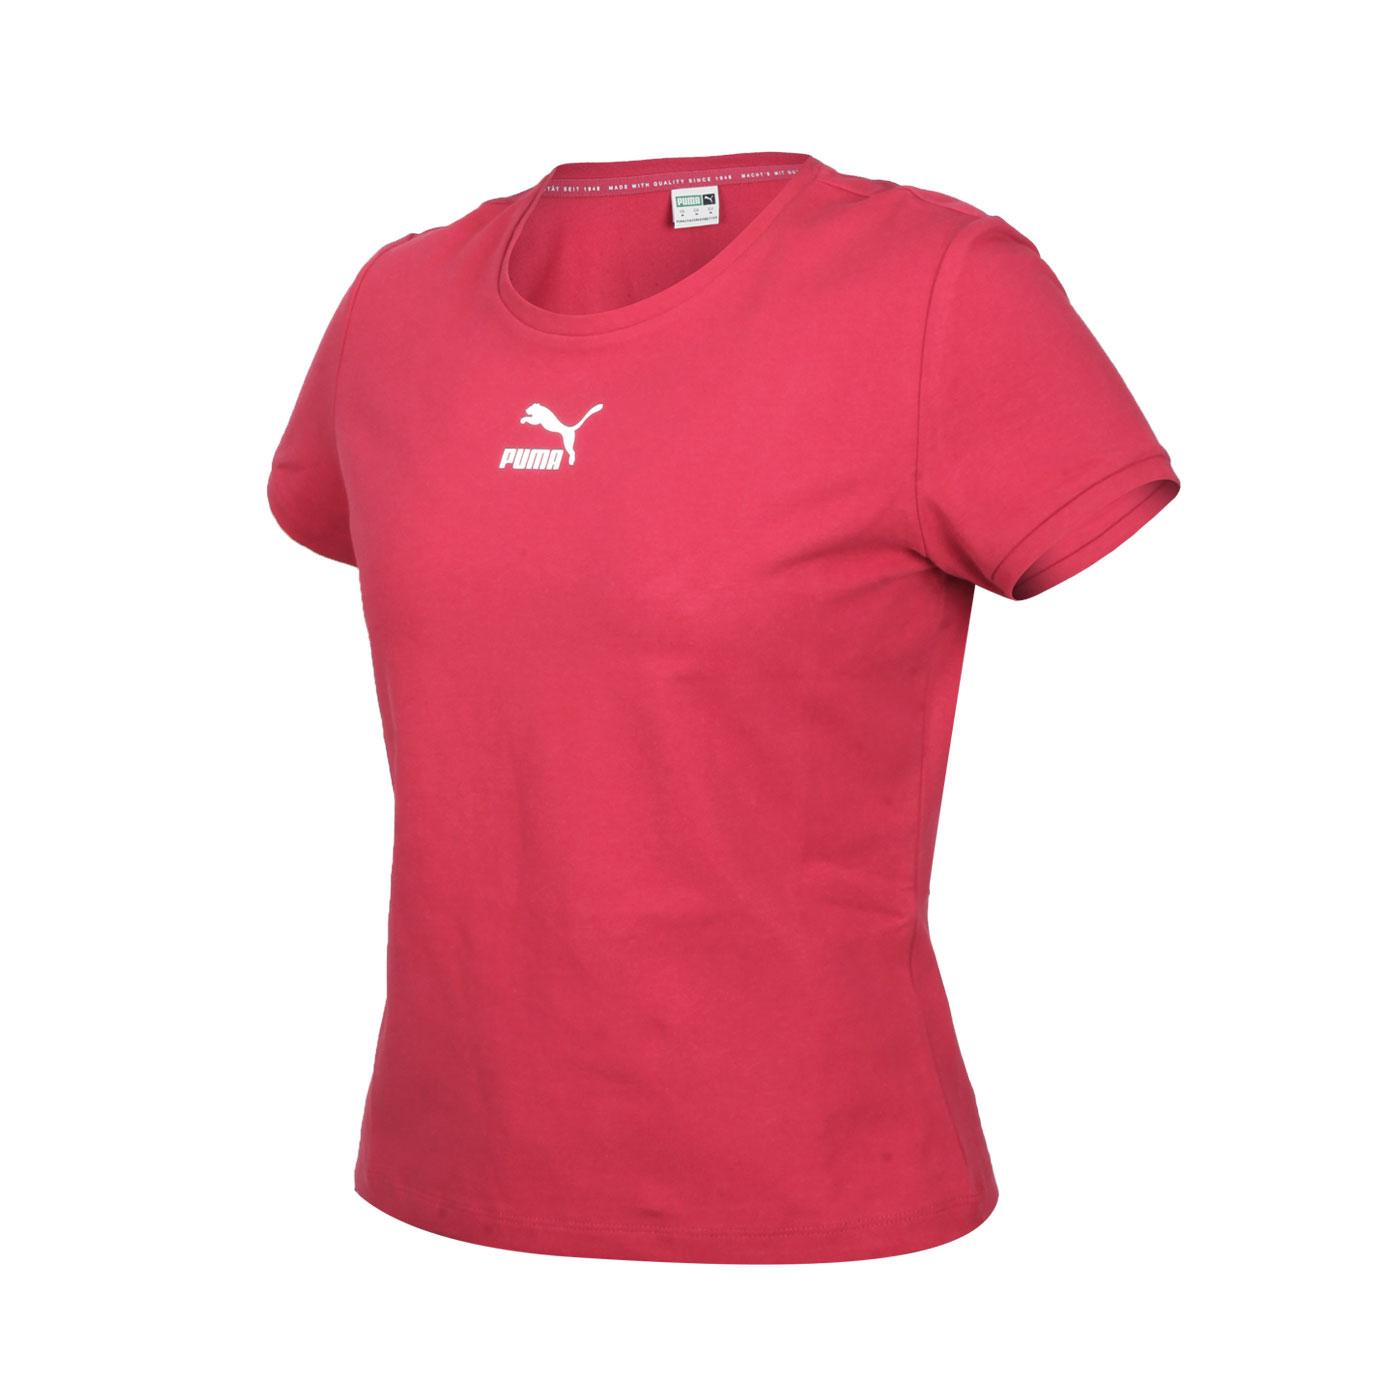 PUMA 女款基本系列Classics貼身短袖T恤 59957722